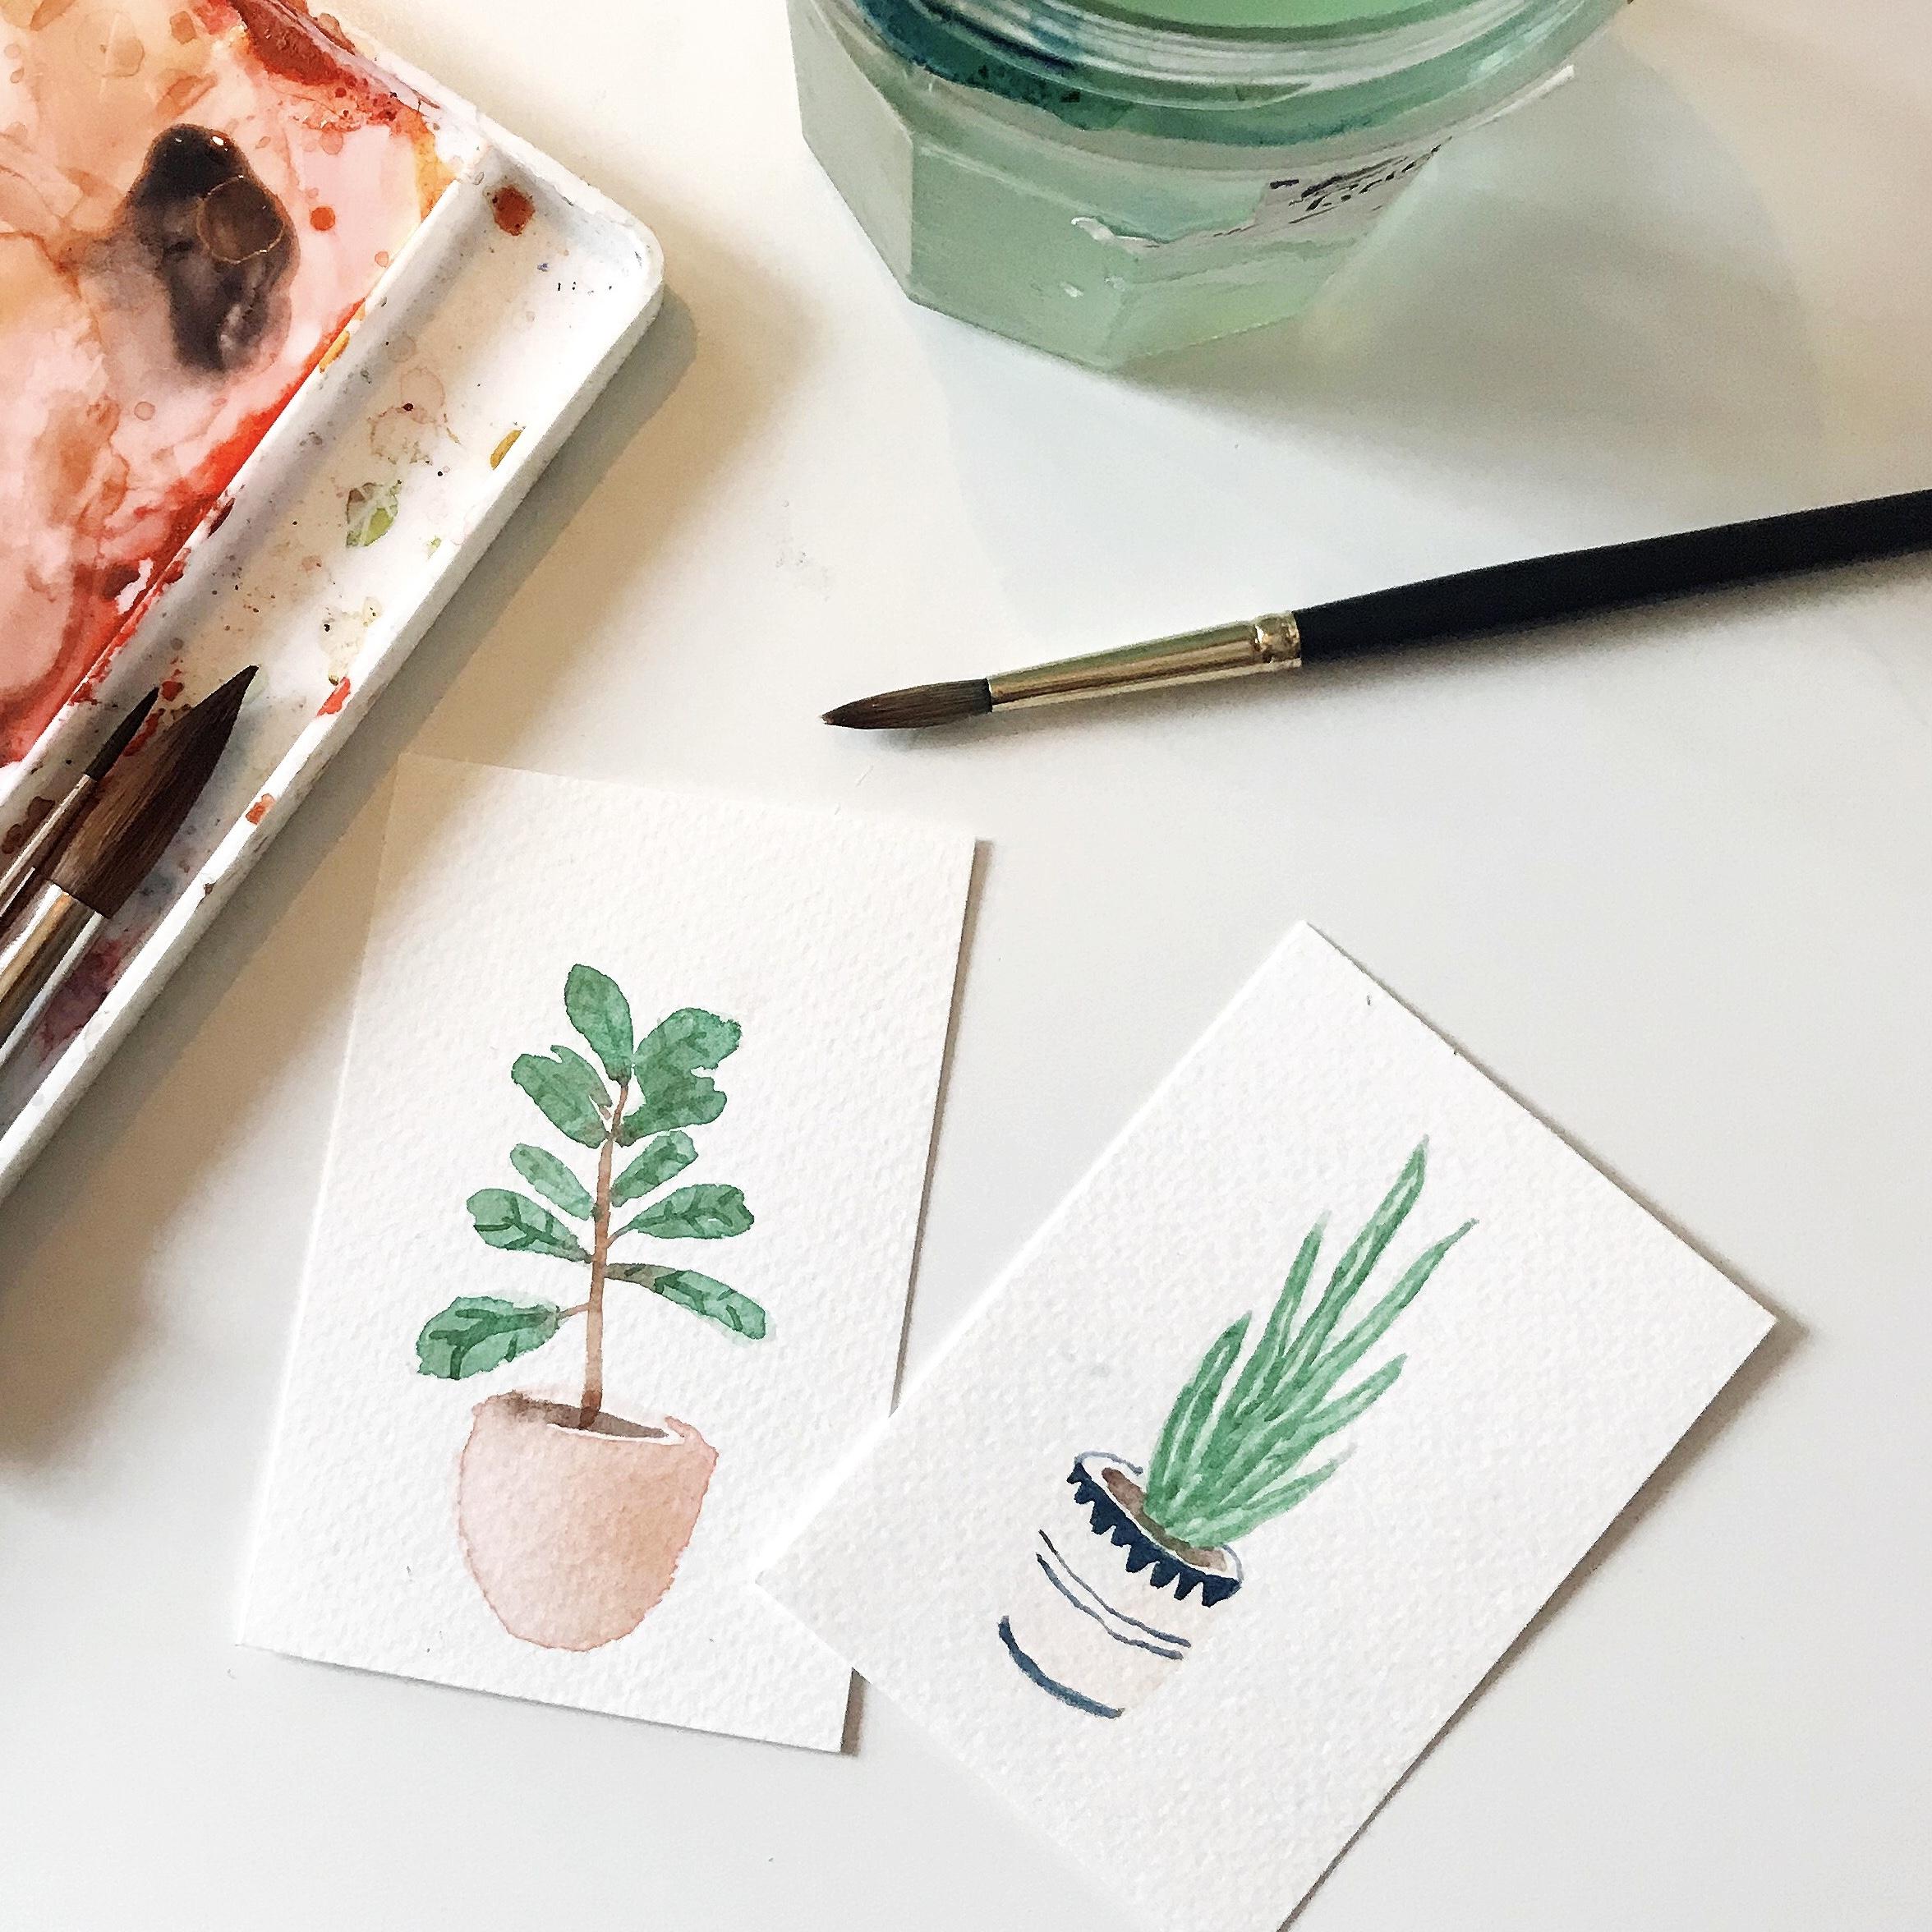 watercolour basics course